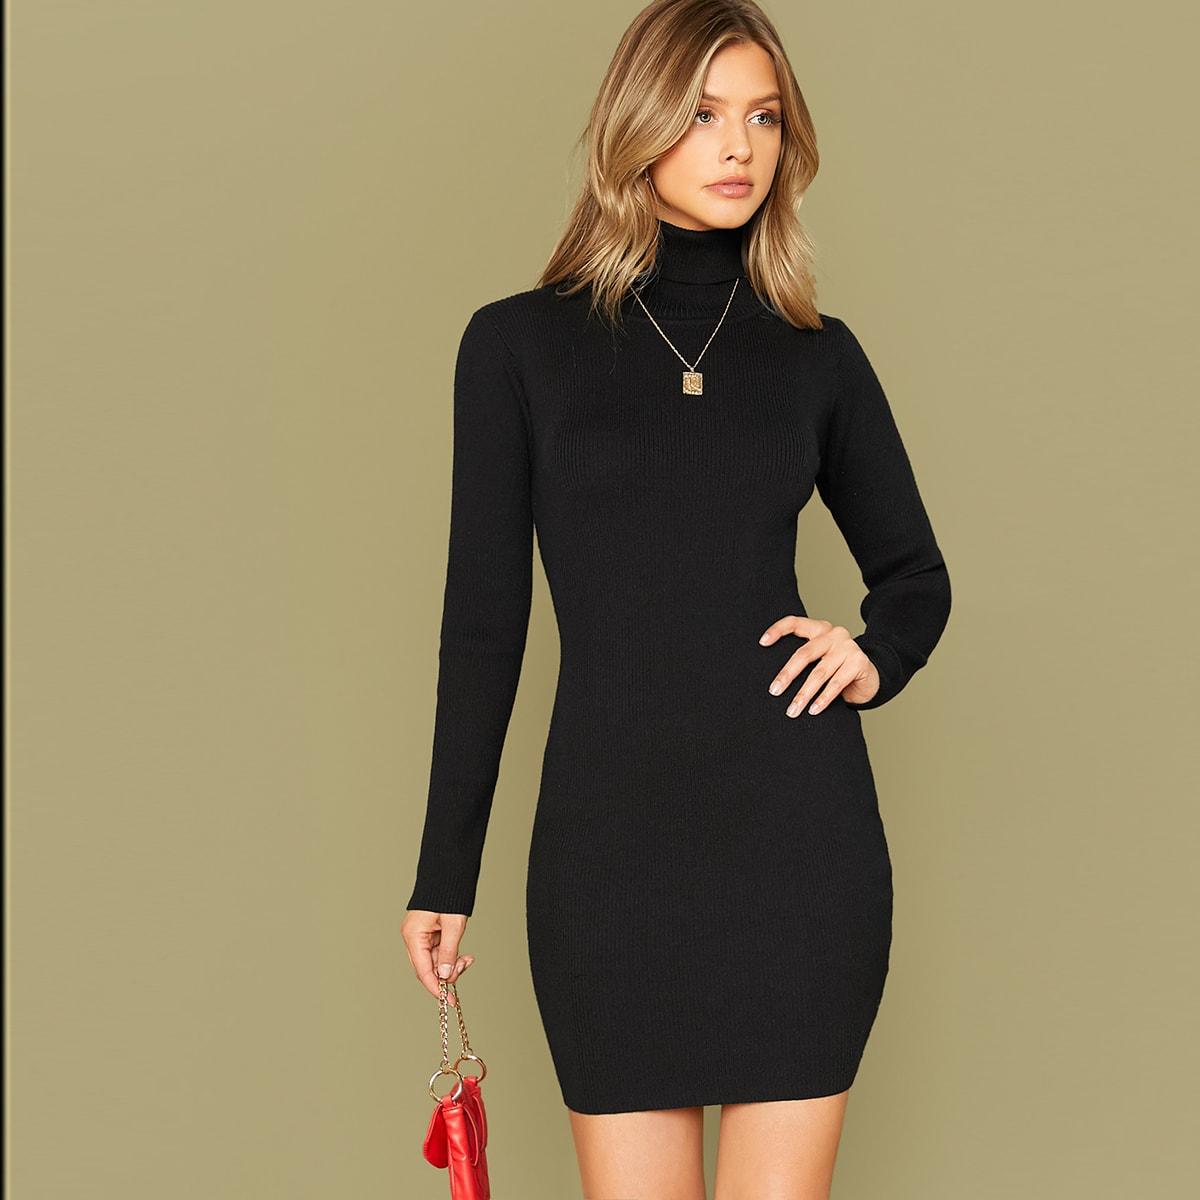 Однотонное свитер-платье без колье SheIn swdress07190801072